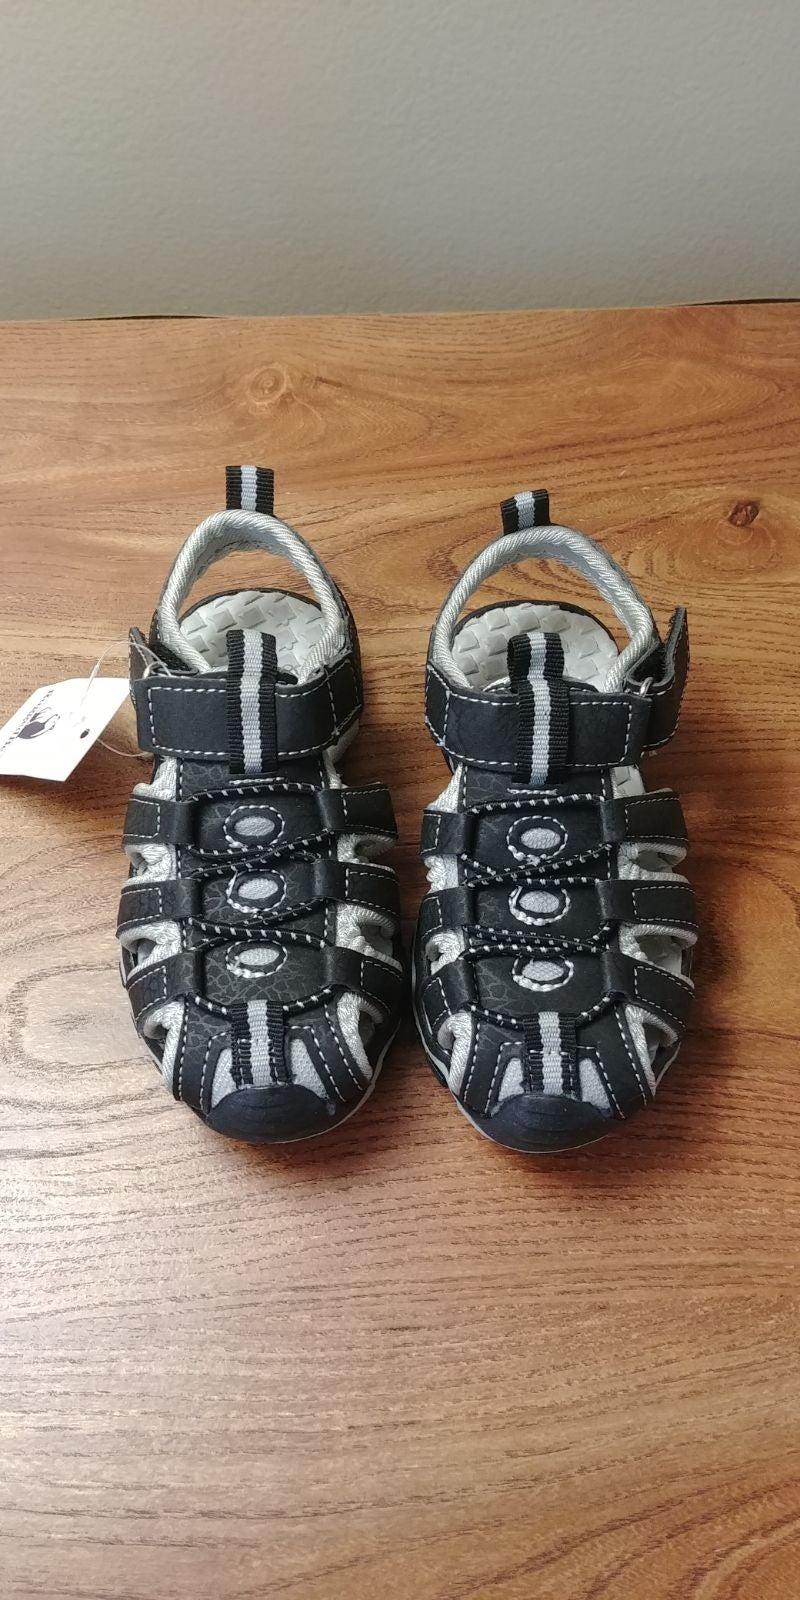 RuggedBear Closed Toe Sandals Toddler